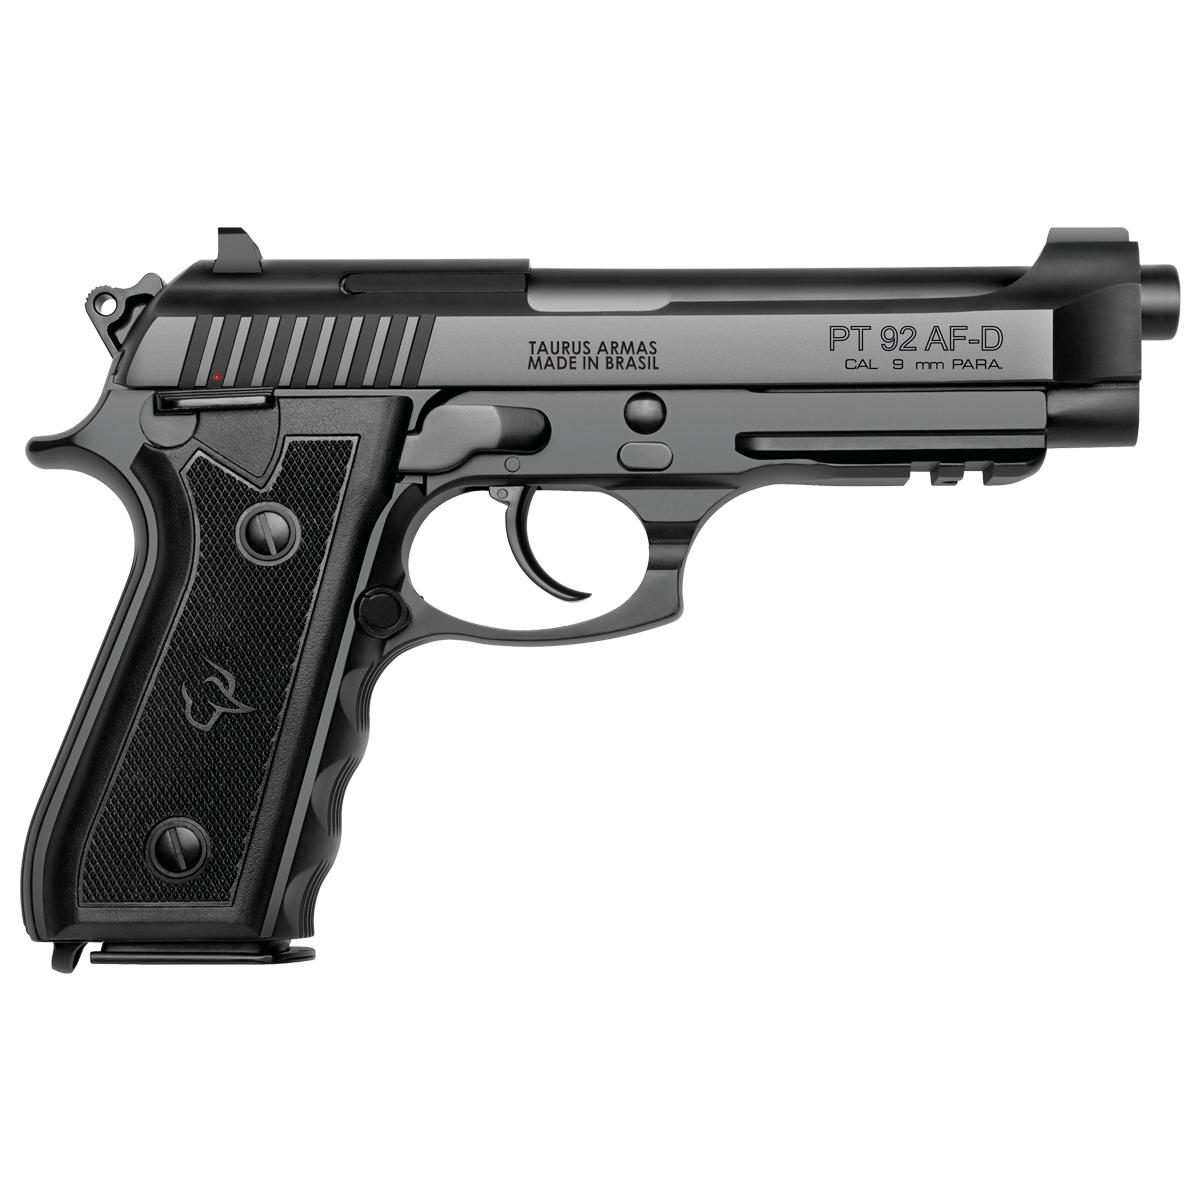 Pistola Taurus 92 AF